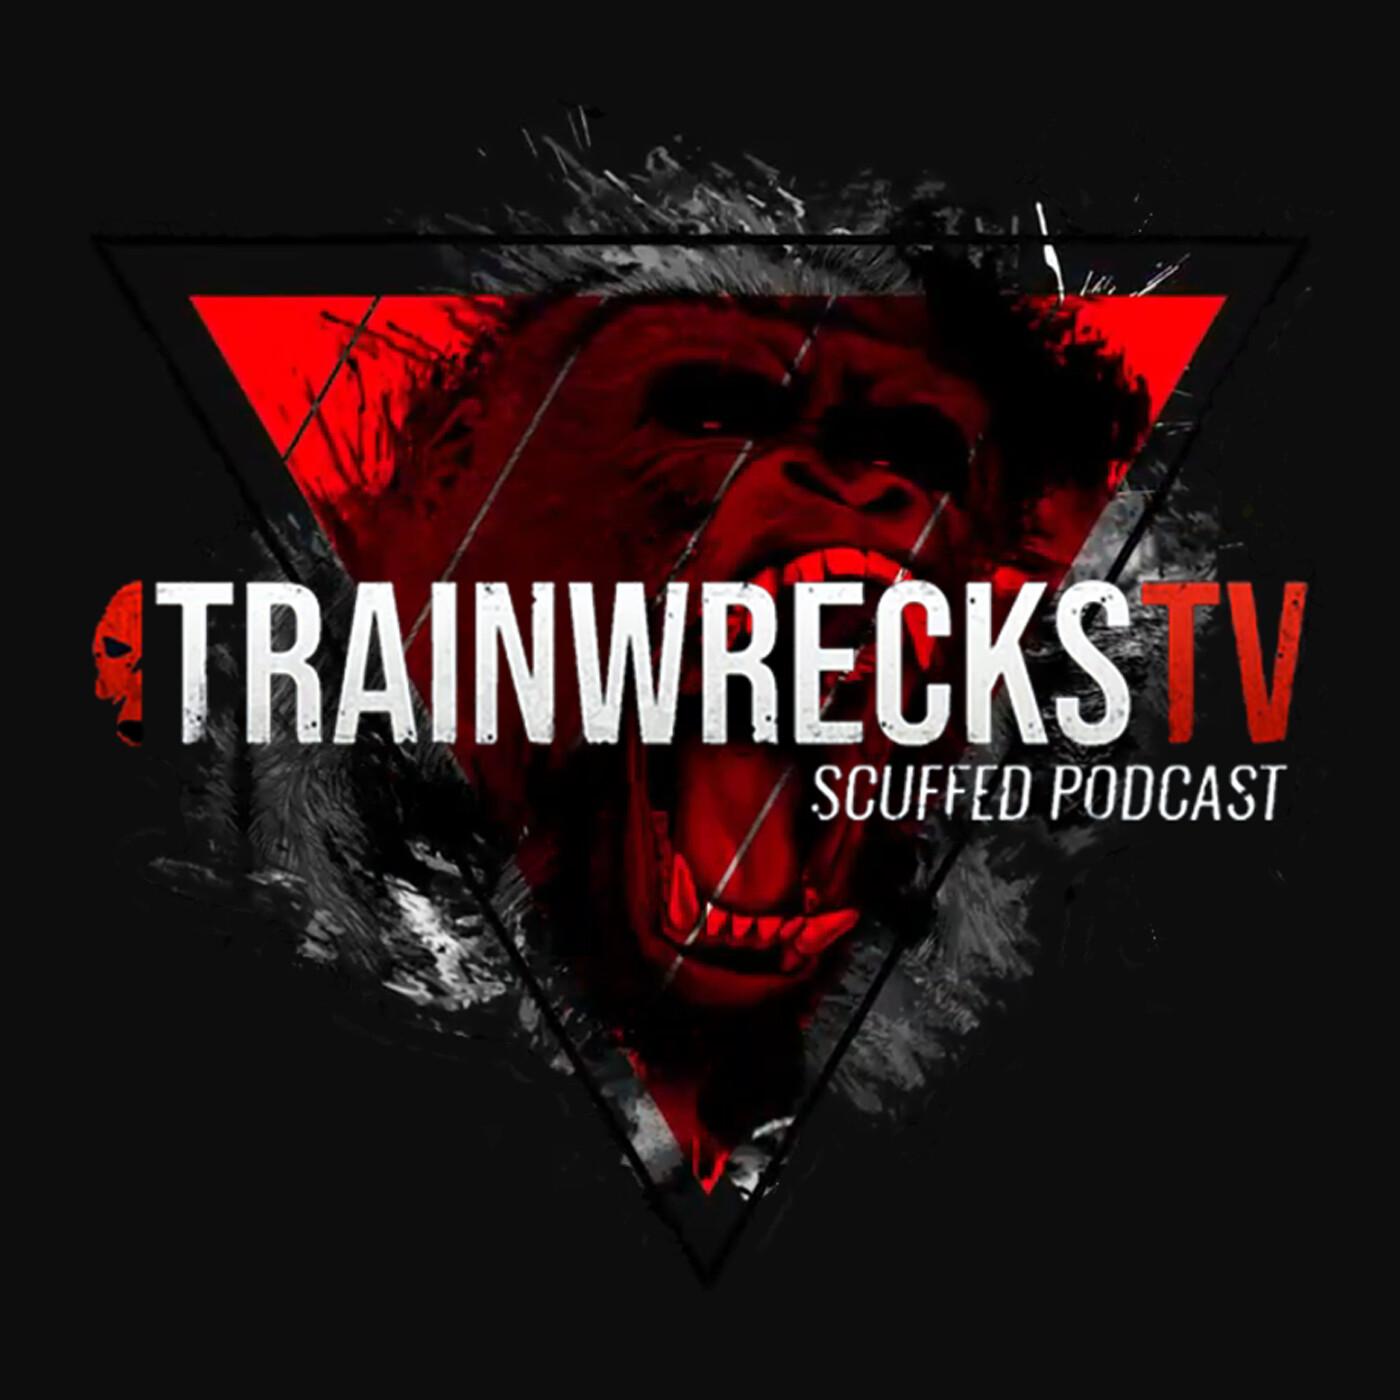 Episode 112 (Feat. Daily Dose, Corinna Kopf, FaZe Banks, and Ludwig)